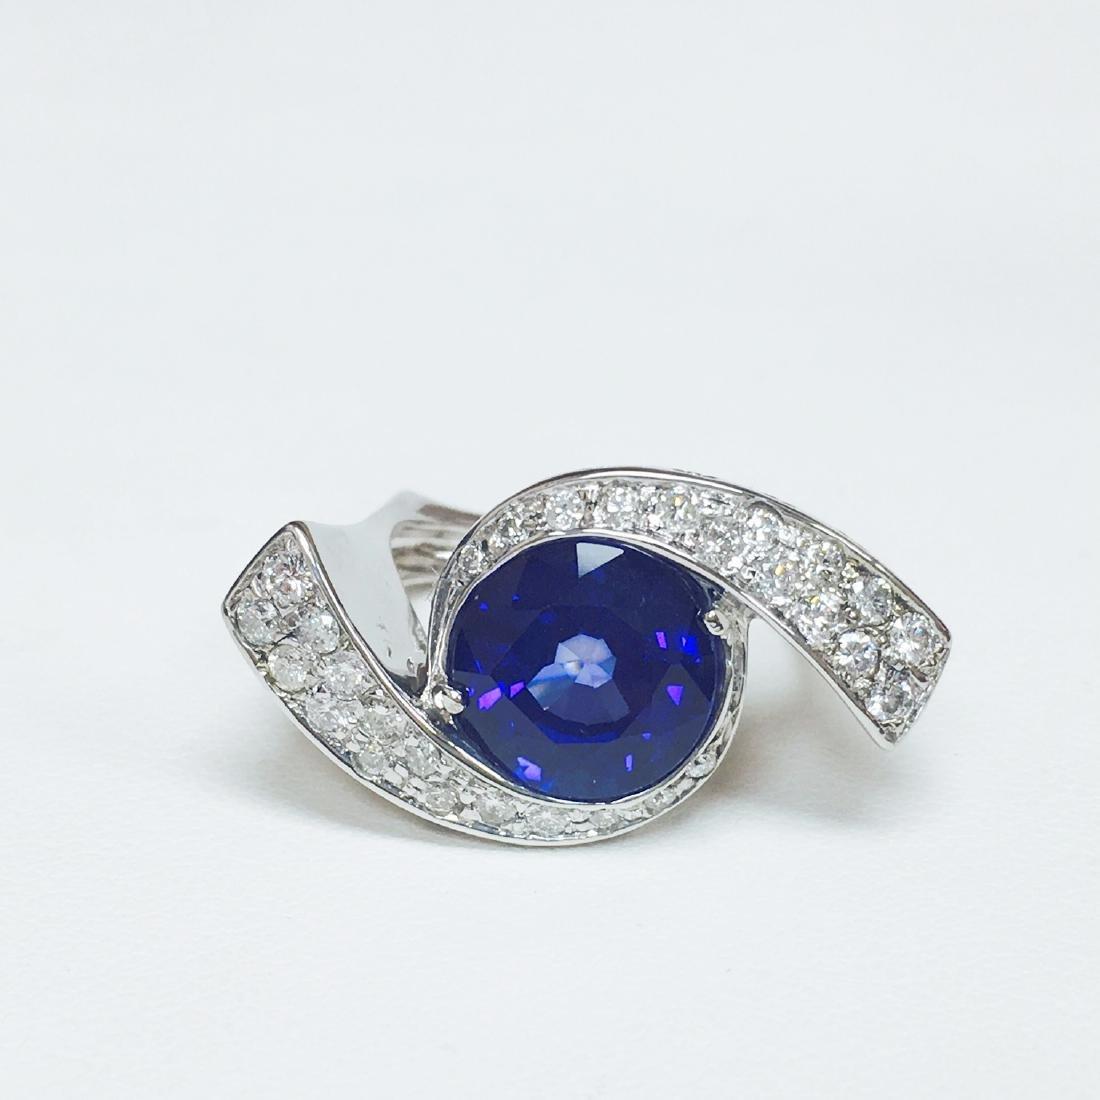 6.00 Carat Blue Sapphire & DIAMOND EVIL EYE STYLE RING